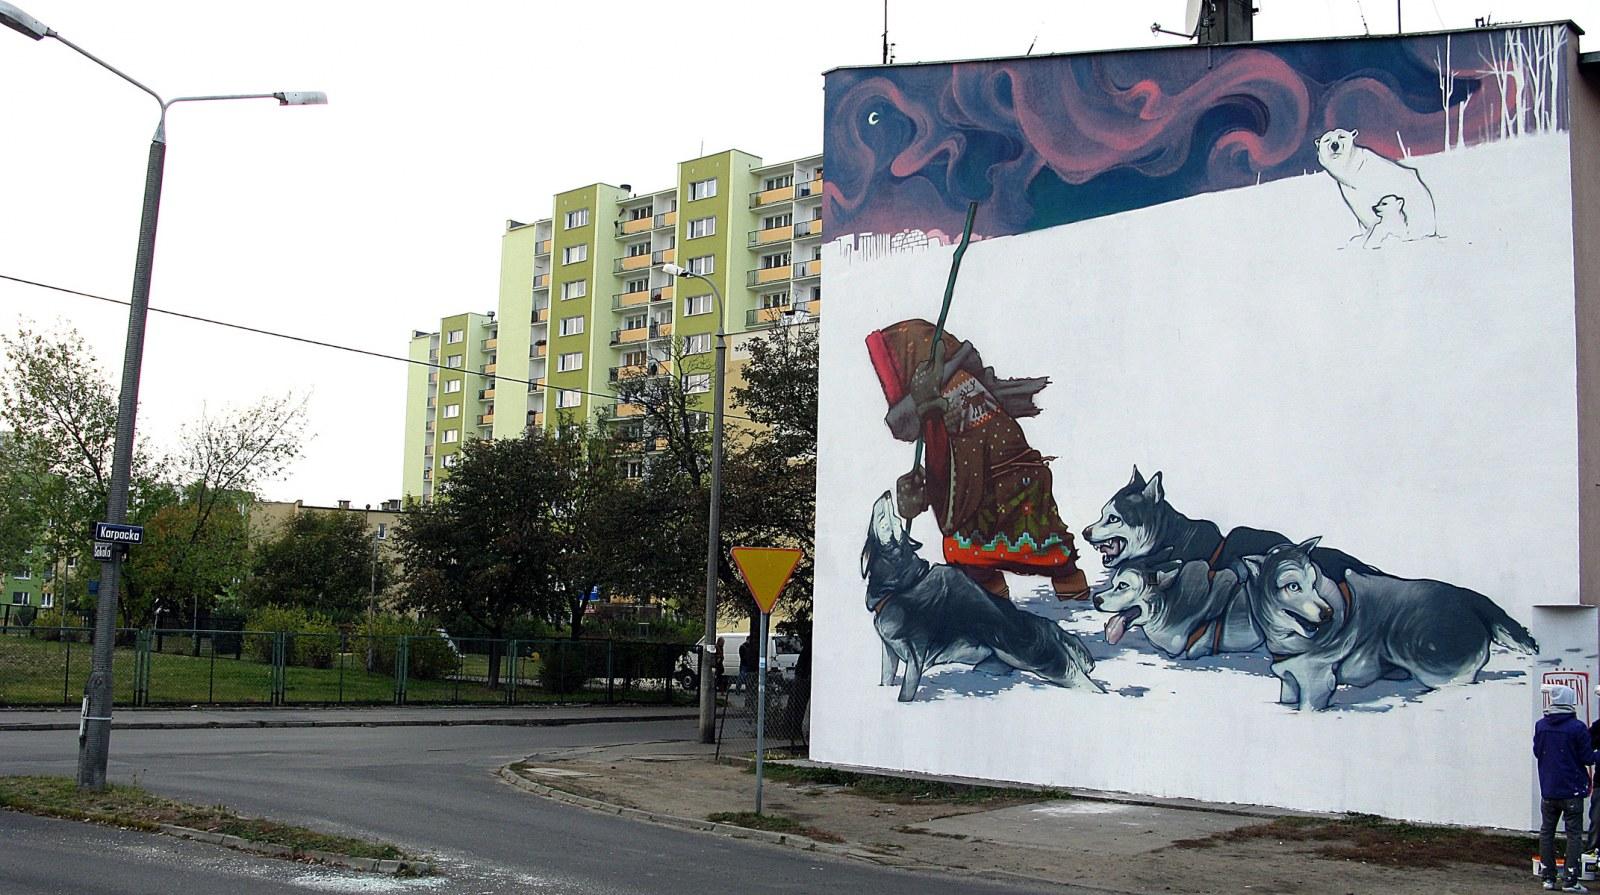 etam-cru-bezt-sainer-street-art-large-murals-08